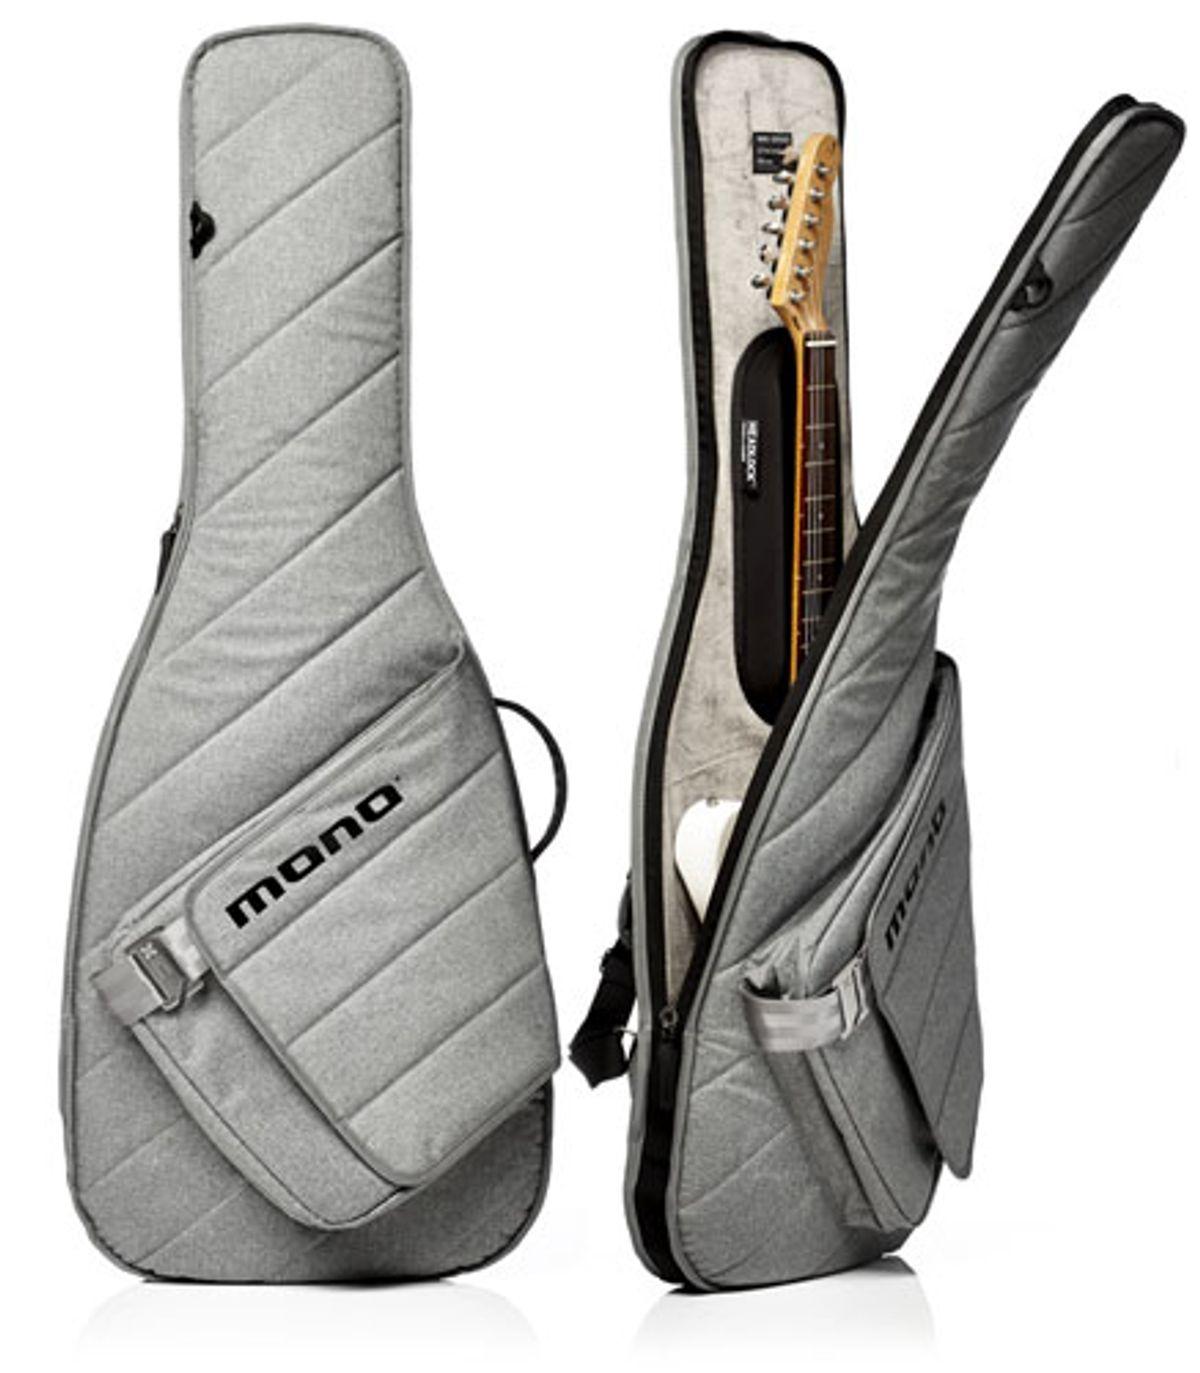 Mono Announces New Guitar Cases